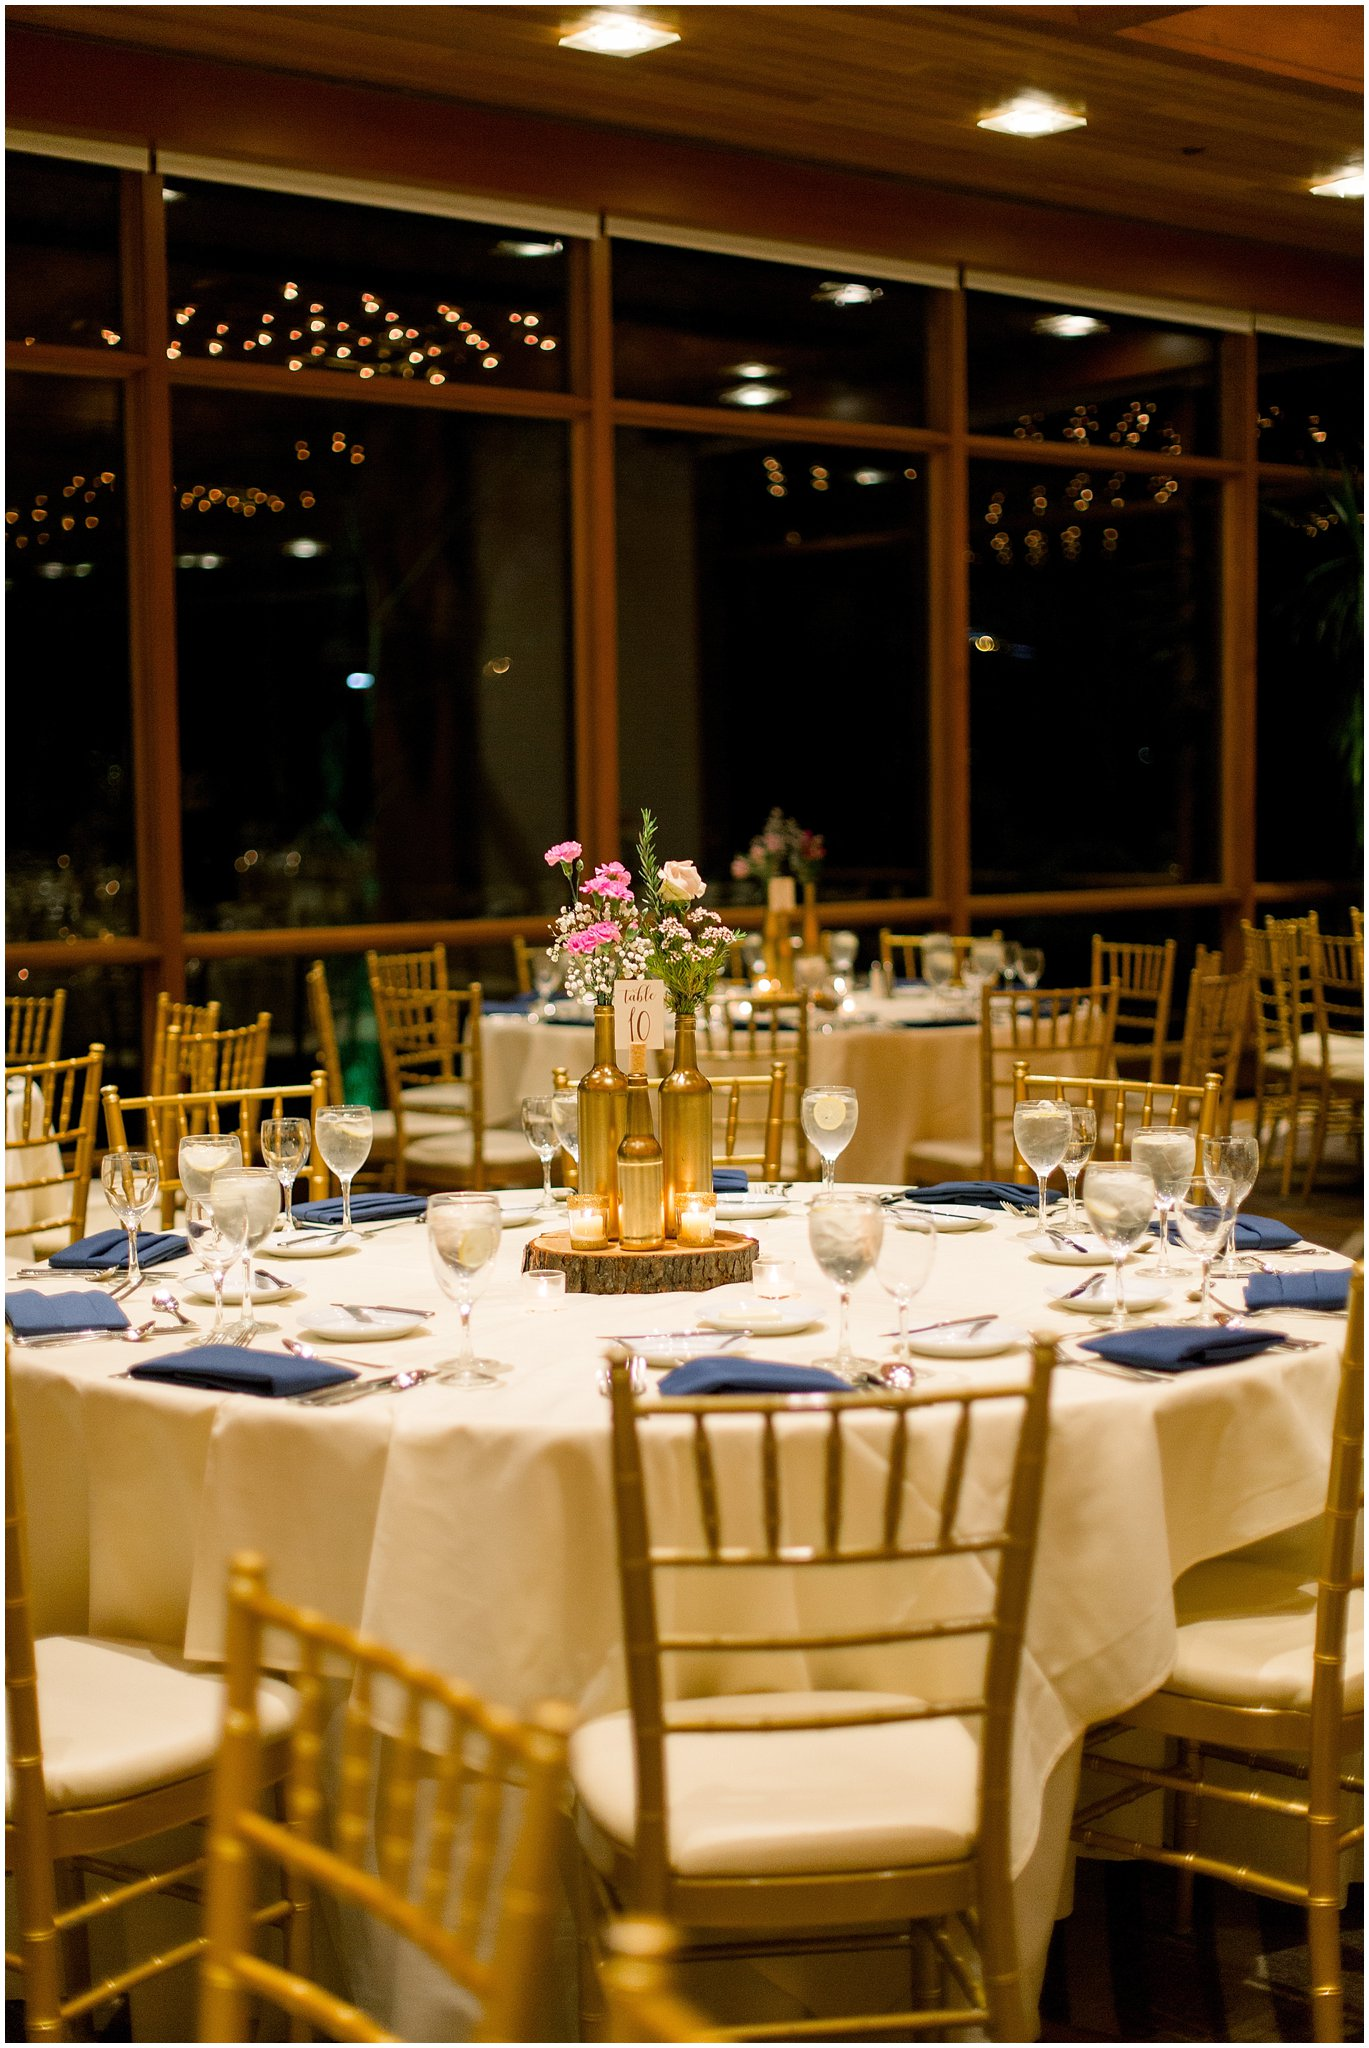 Hyatt-Lodge-Mcdonald-Campus-Wedding_0060.jpg